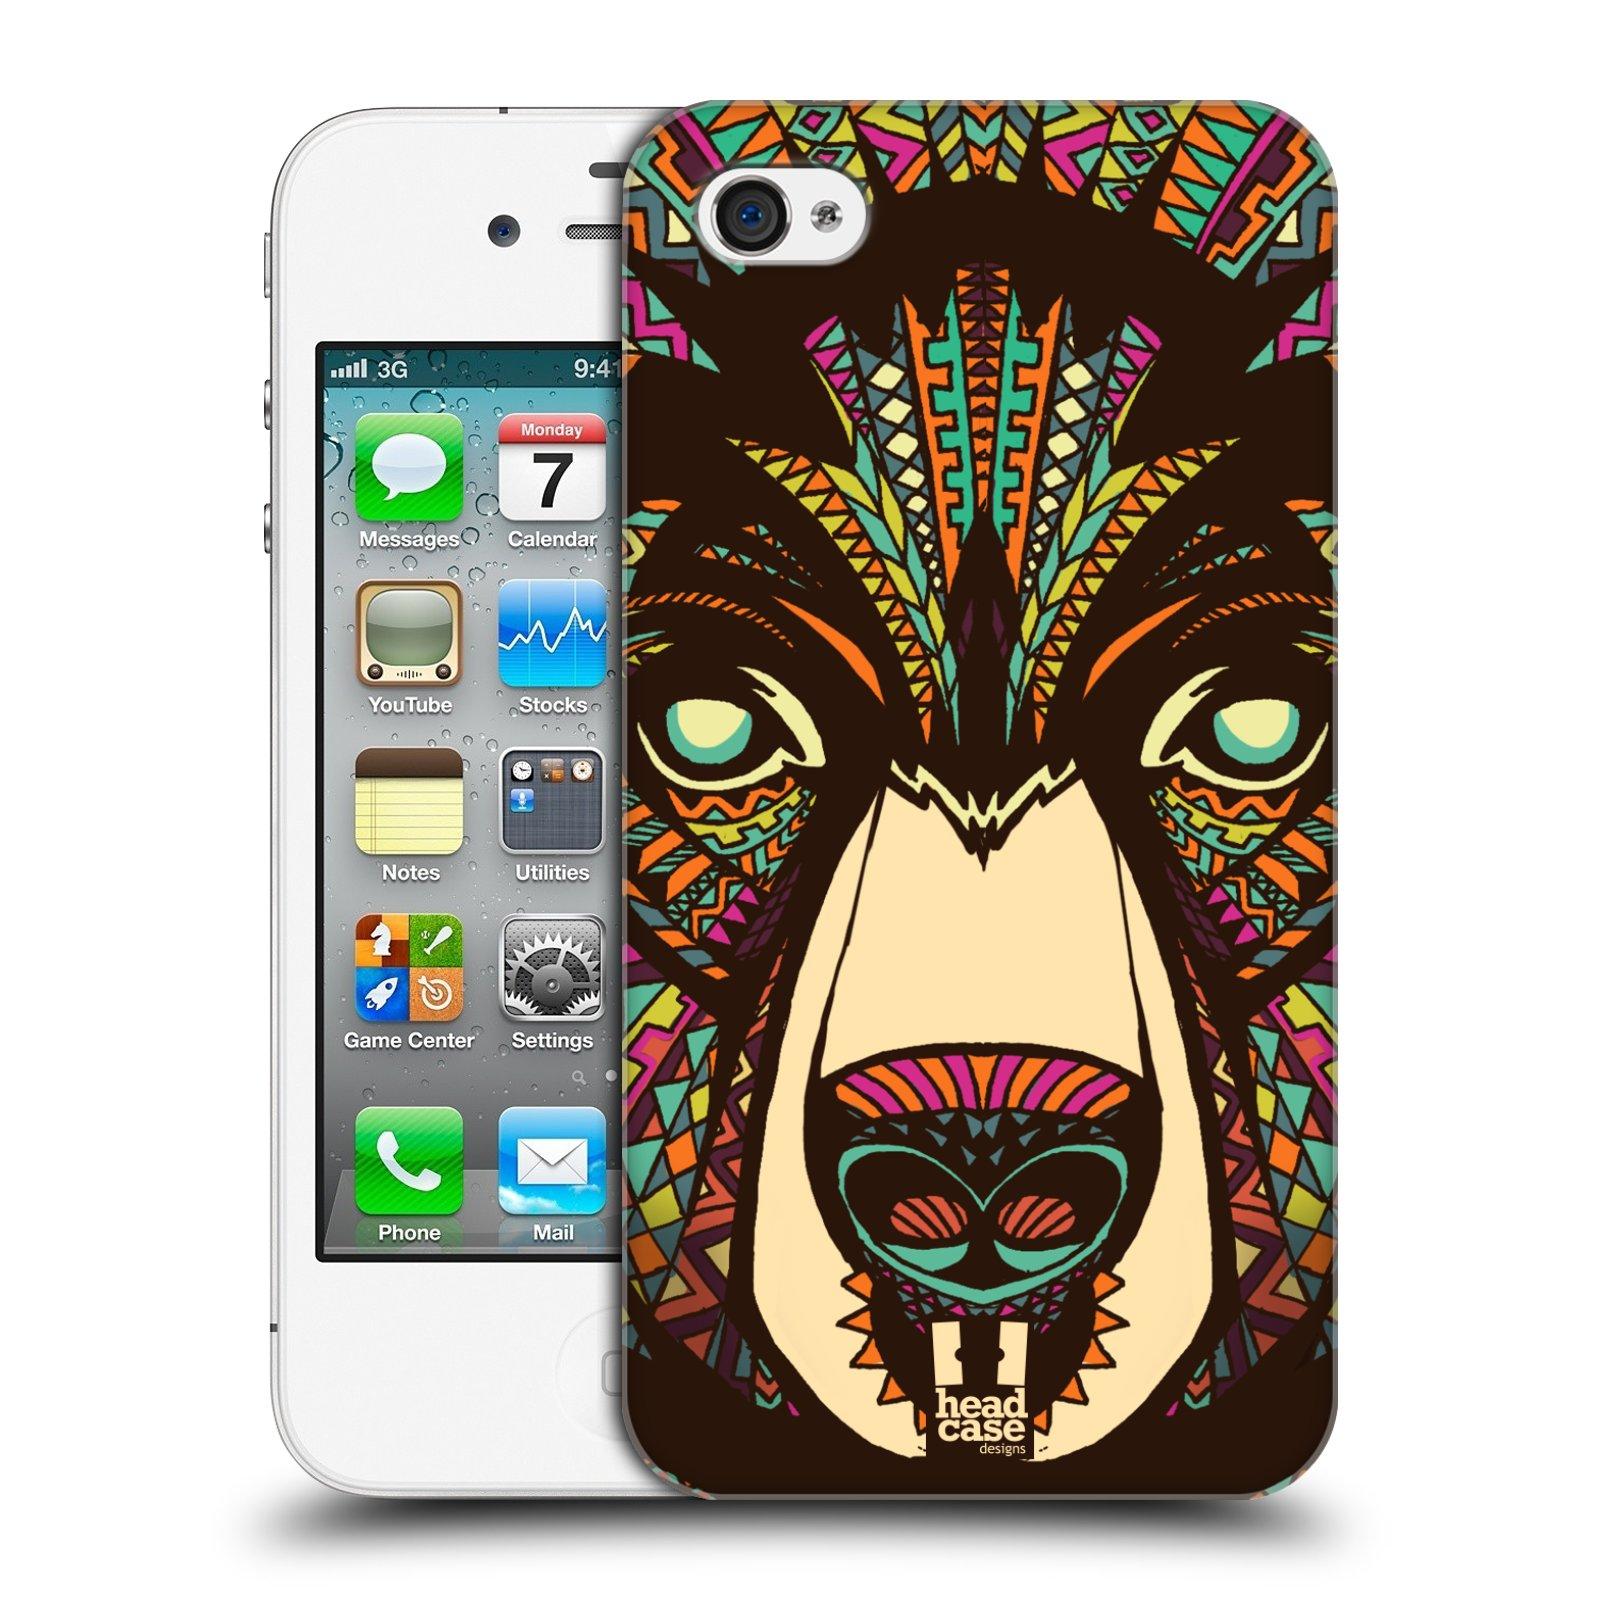 Plastové pouzdro na mobil Apple iPhone 4 a 4S HEAD CASE AZTEC MEDVĚD